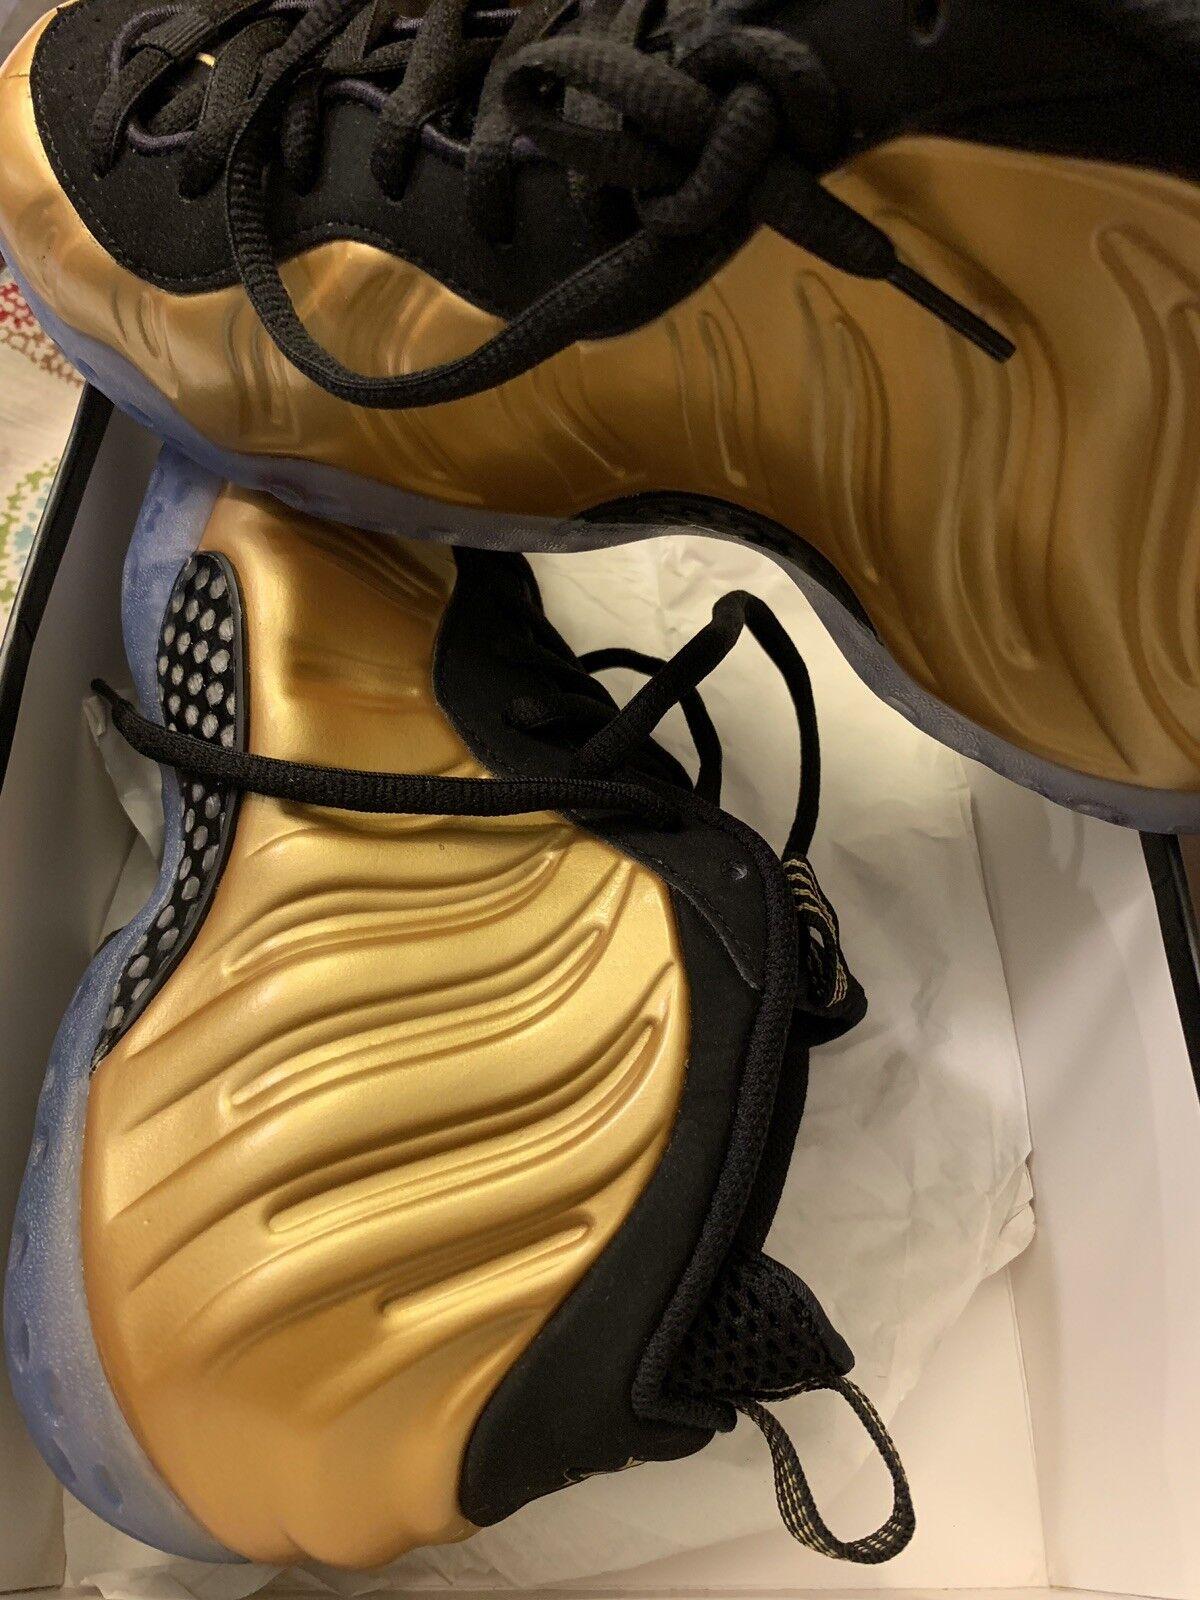 New Nike Air Foamposite One Metallic gold Black (314996-700) Size 8.5 Dead Stock